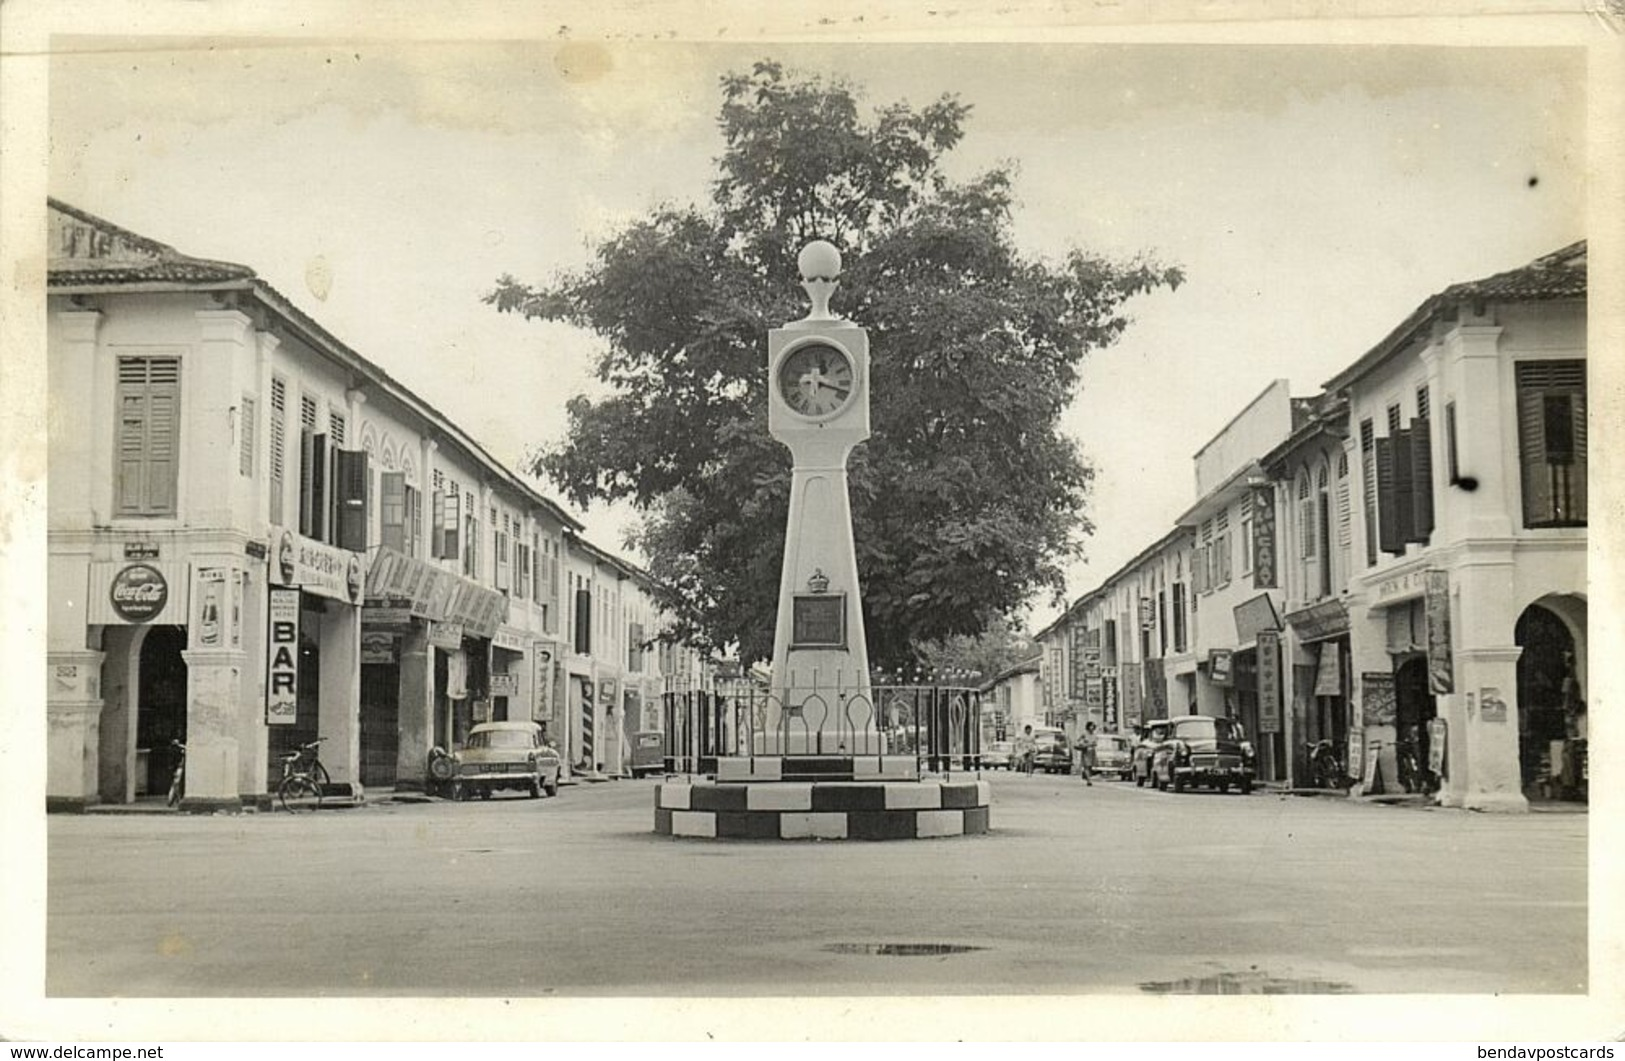 Malay Malaysia, PORT DICKSON, Clock Tower, Cars, Coca Cola (1950s) Real Photo - Malaysia